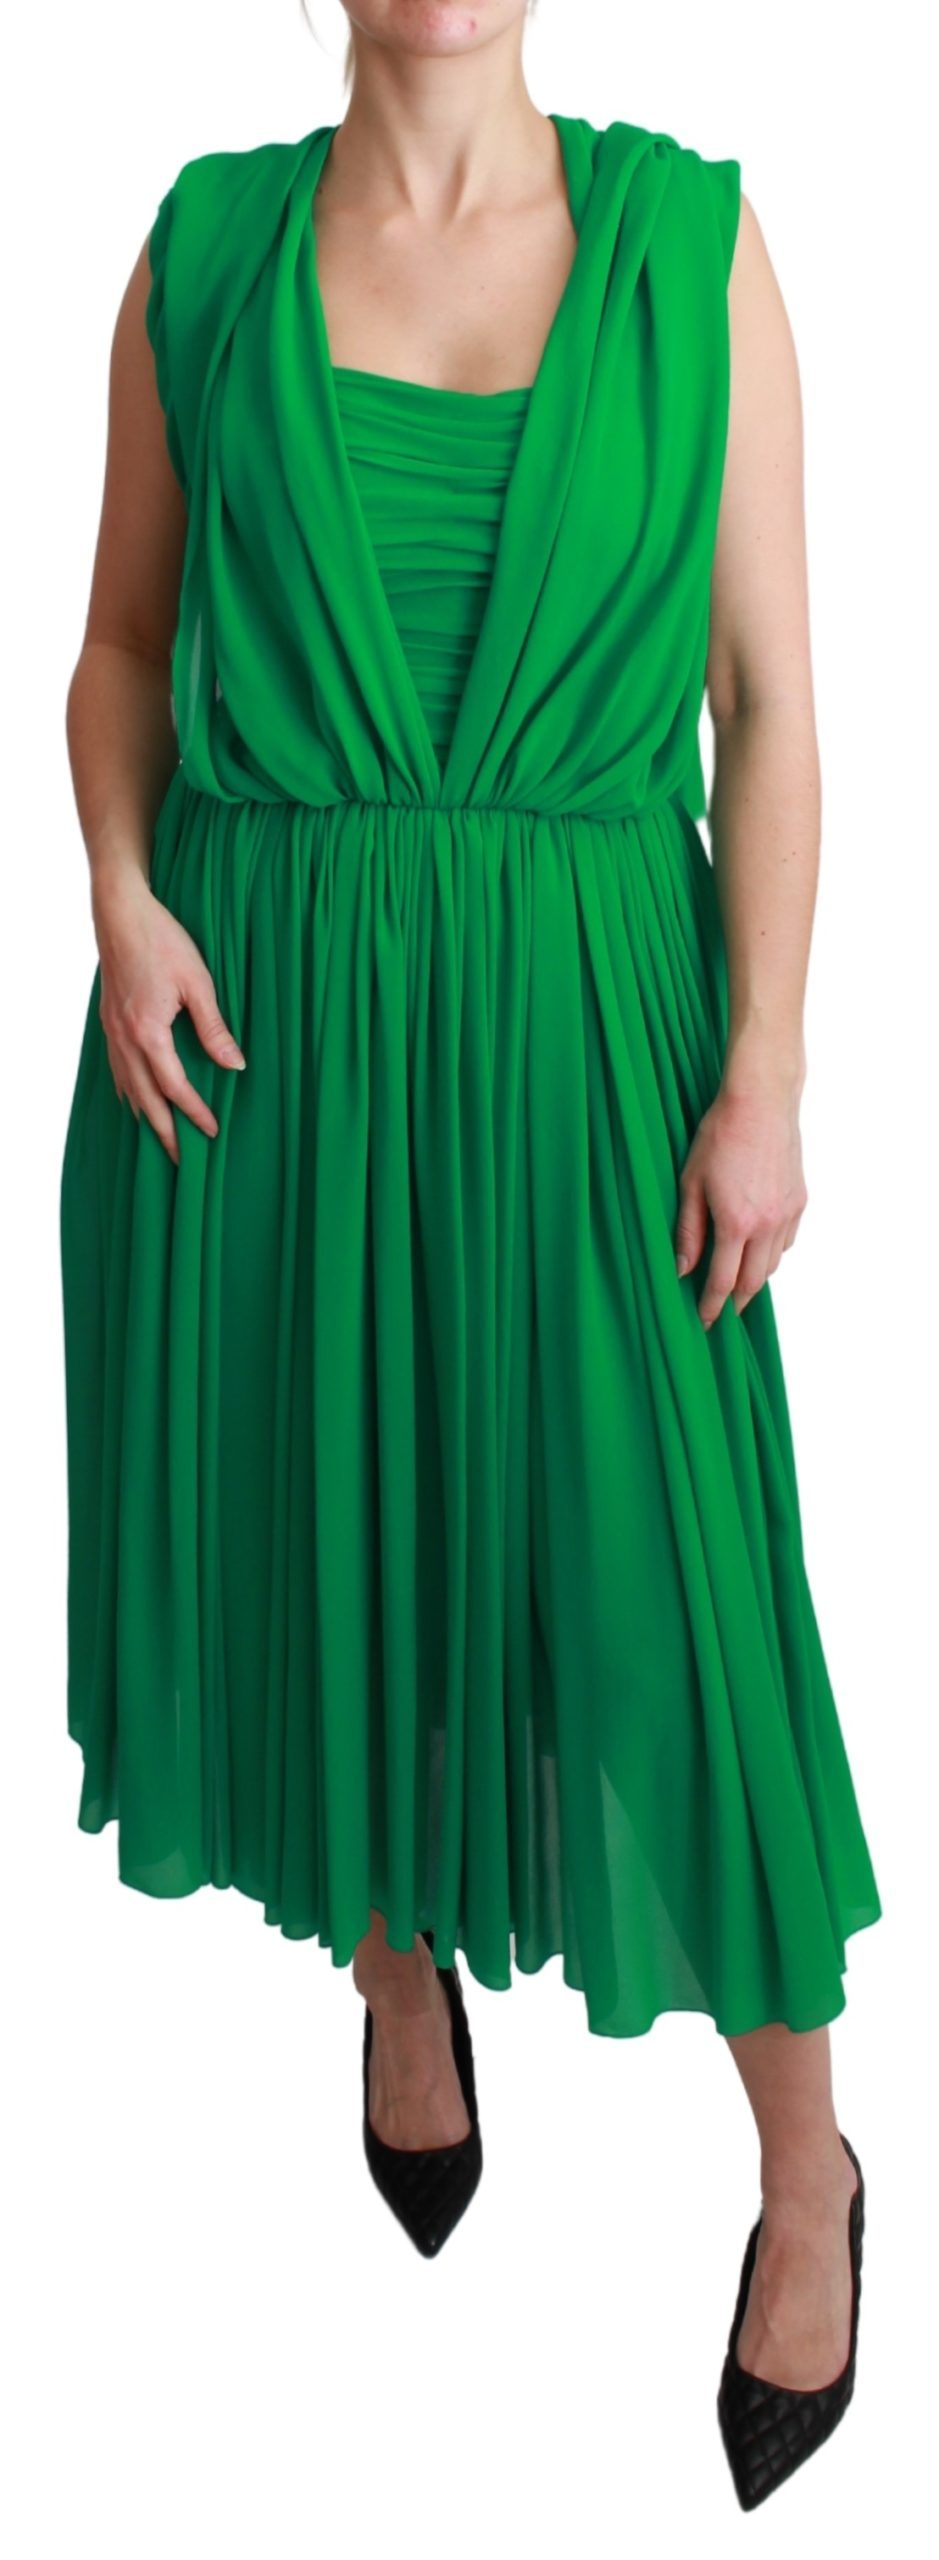 Dolce & Gabbana Women's Silk Sleeveless Pleated Dress Green DR2557 - IT40|S